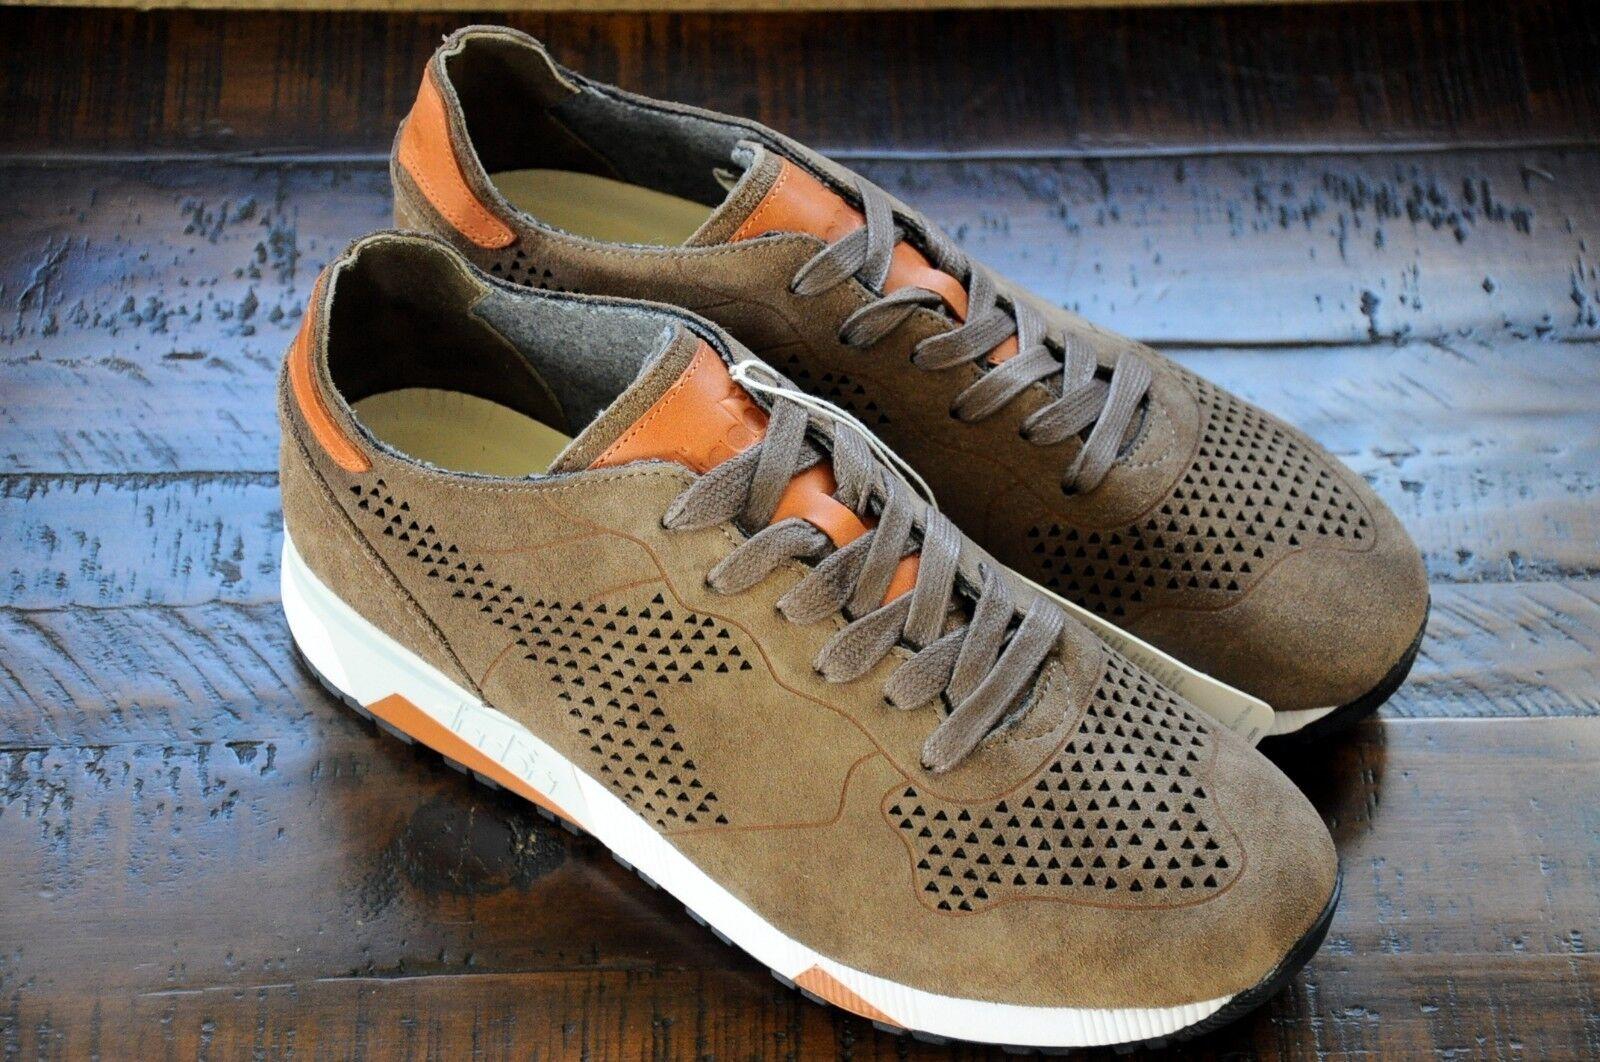 Diadora Heritage TRIDENT 90 SUPERIOR PERF Leather Sneakers- Men's US 9.5 New